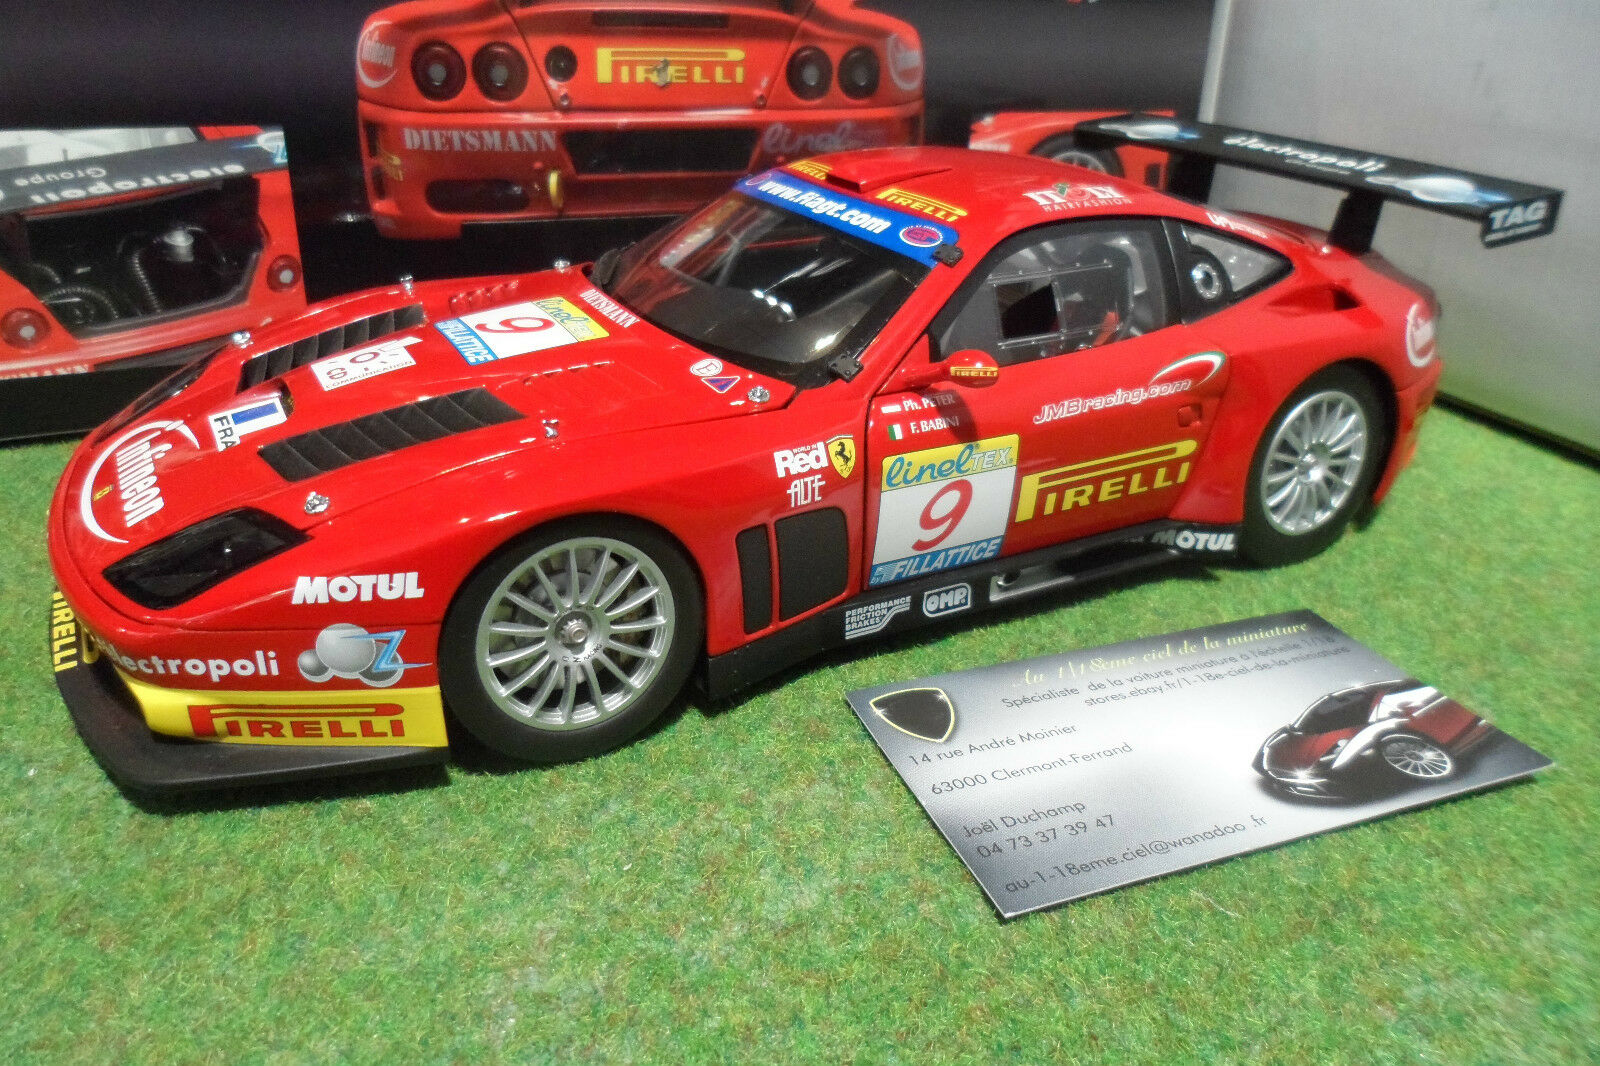 FERRARI 575 GTC ESTORIL 2003  9 TEAM J.M.B 1 18 KYOSHO 08393B voiture miniature